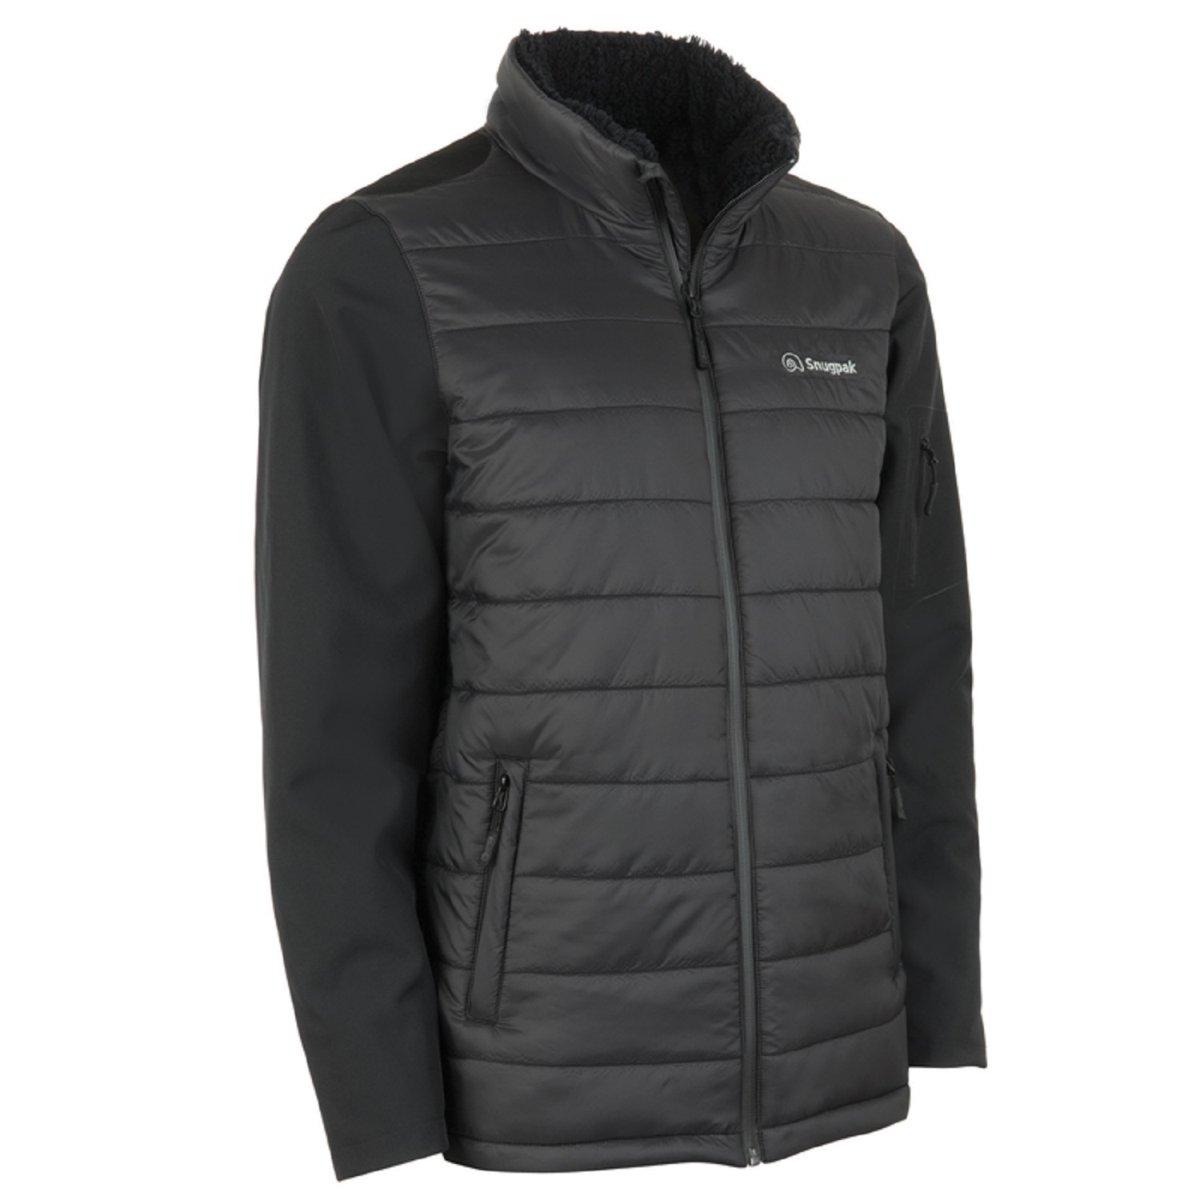 Snugpak - Fusion Insulated Jacket - Black - XXL